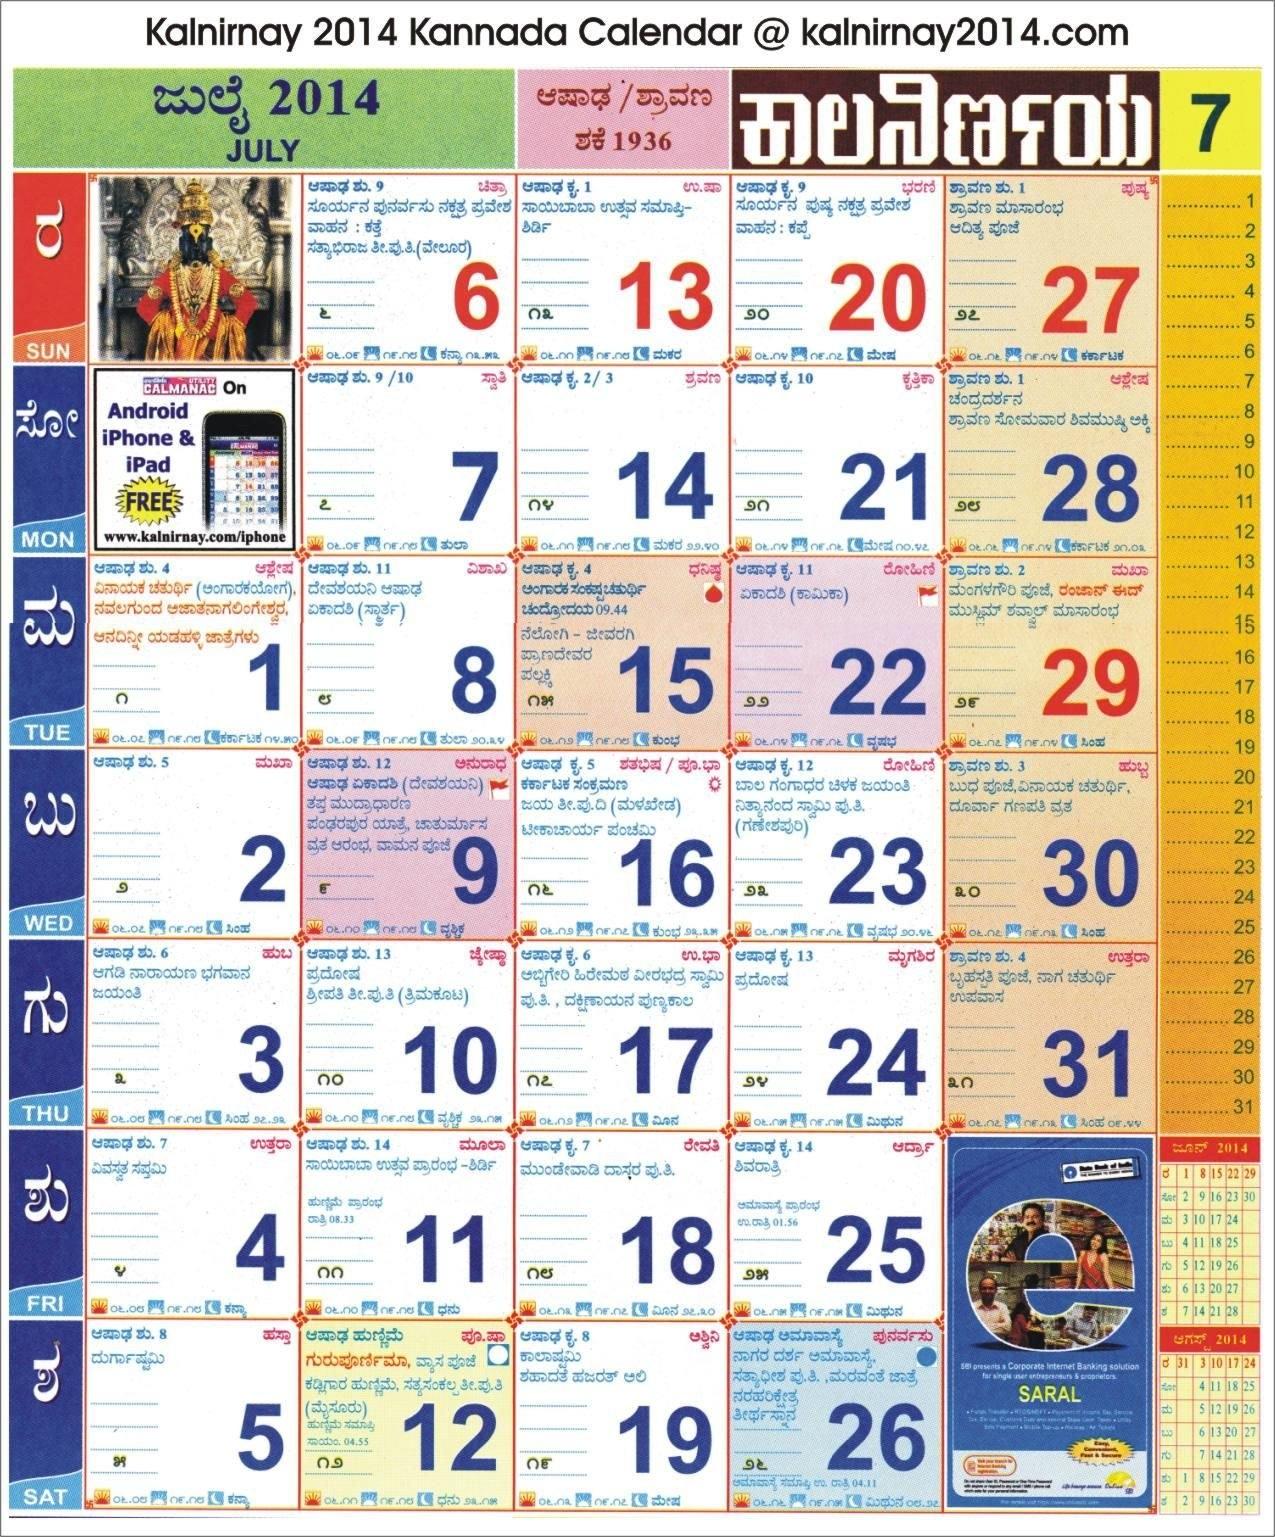 July 2014 Kannada Kalnirnay Calendar   2014 Kannada Kalnirnay P C Shabadimath Kannada Calendar 2019